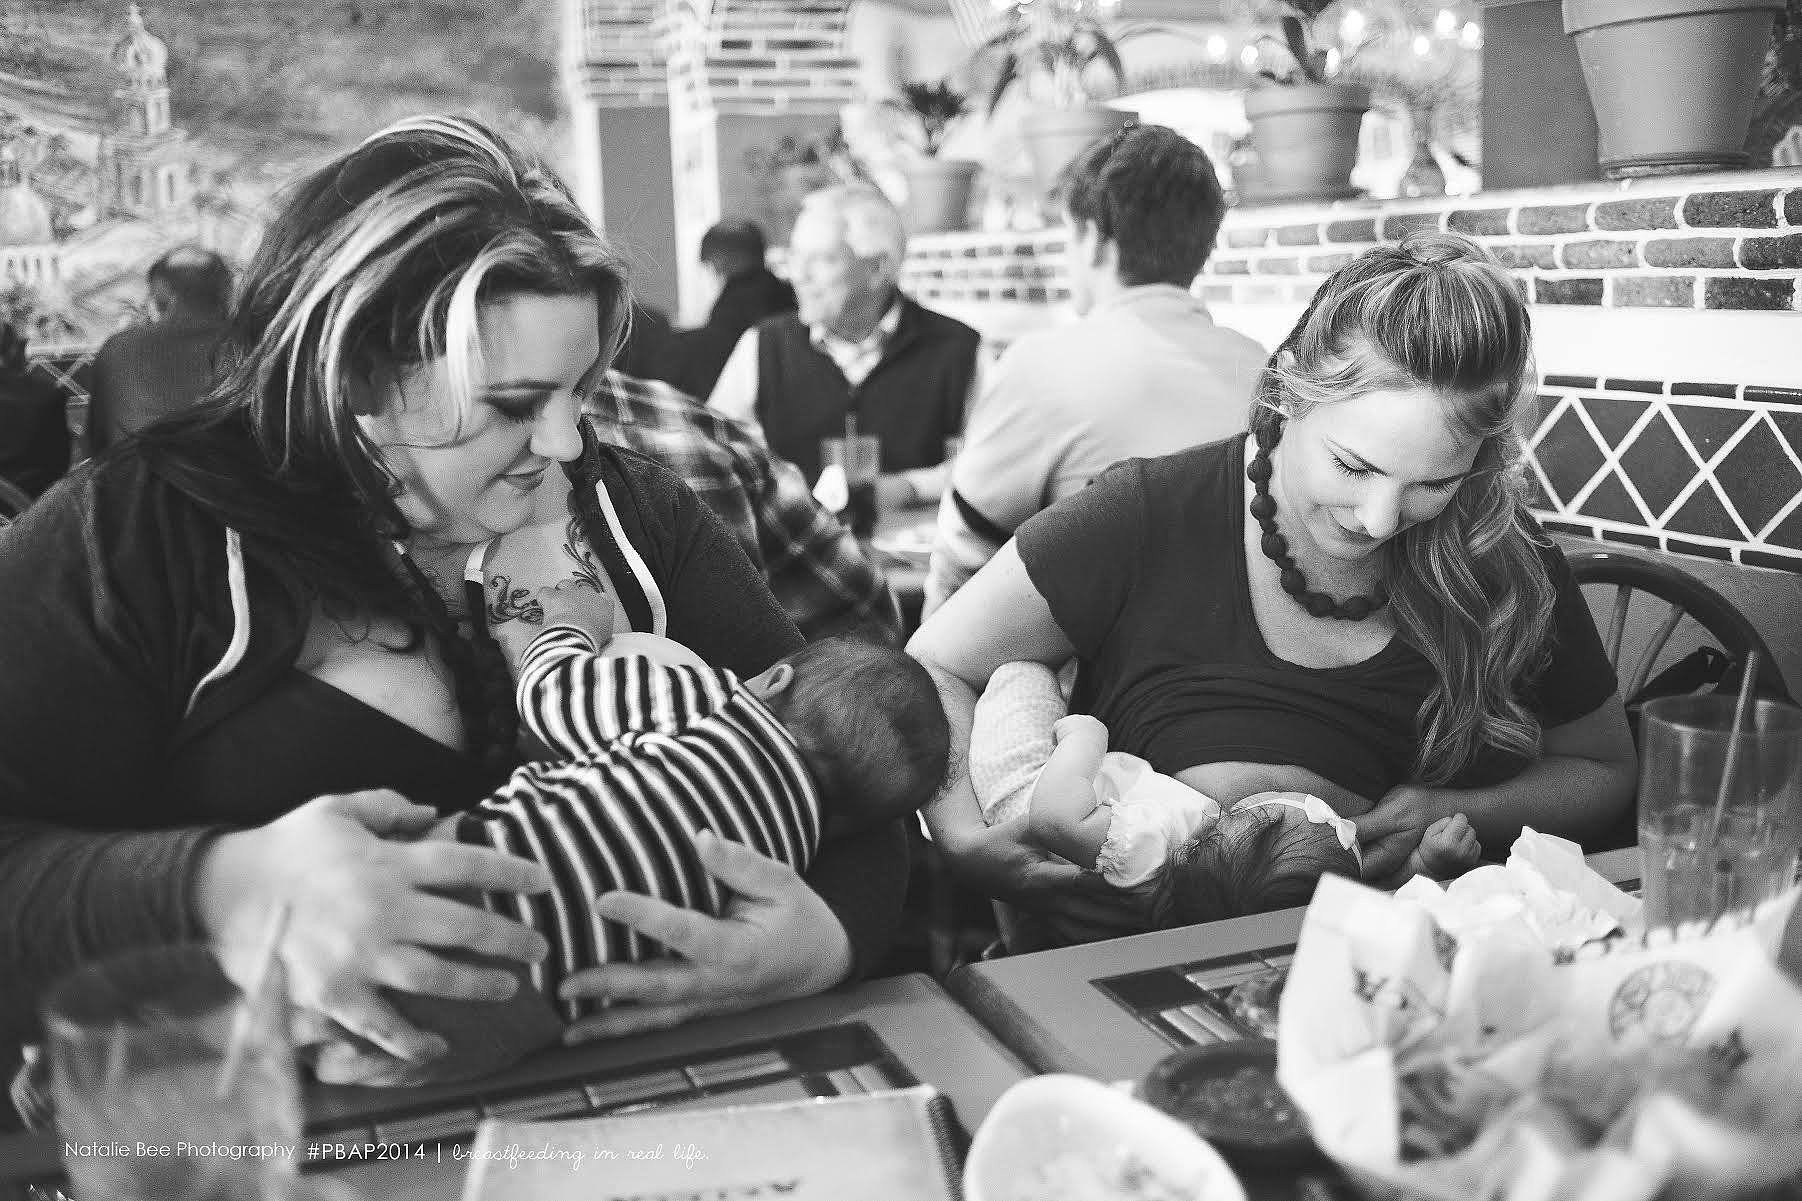 ... of Moms Breastfeeding Their Children at Every Stage | POPSUGAR Moms